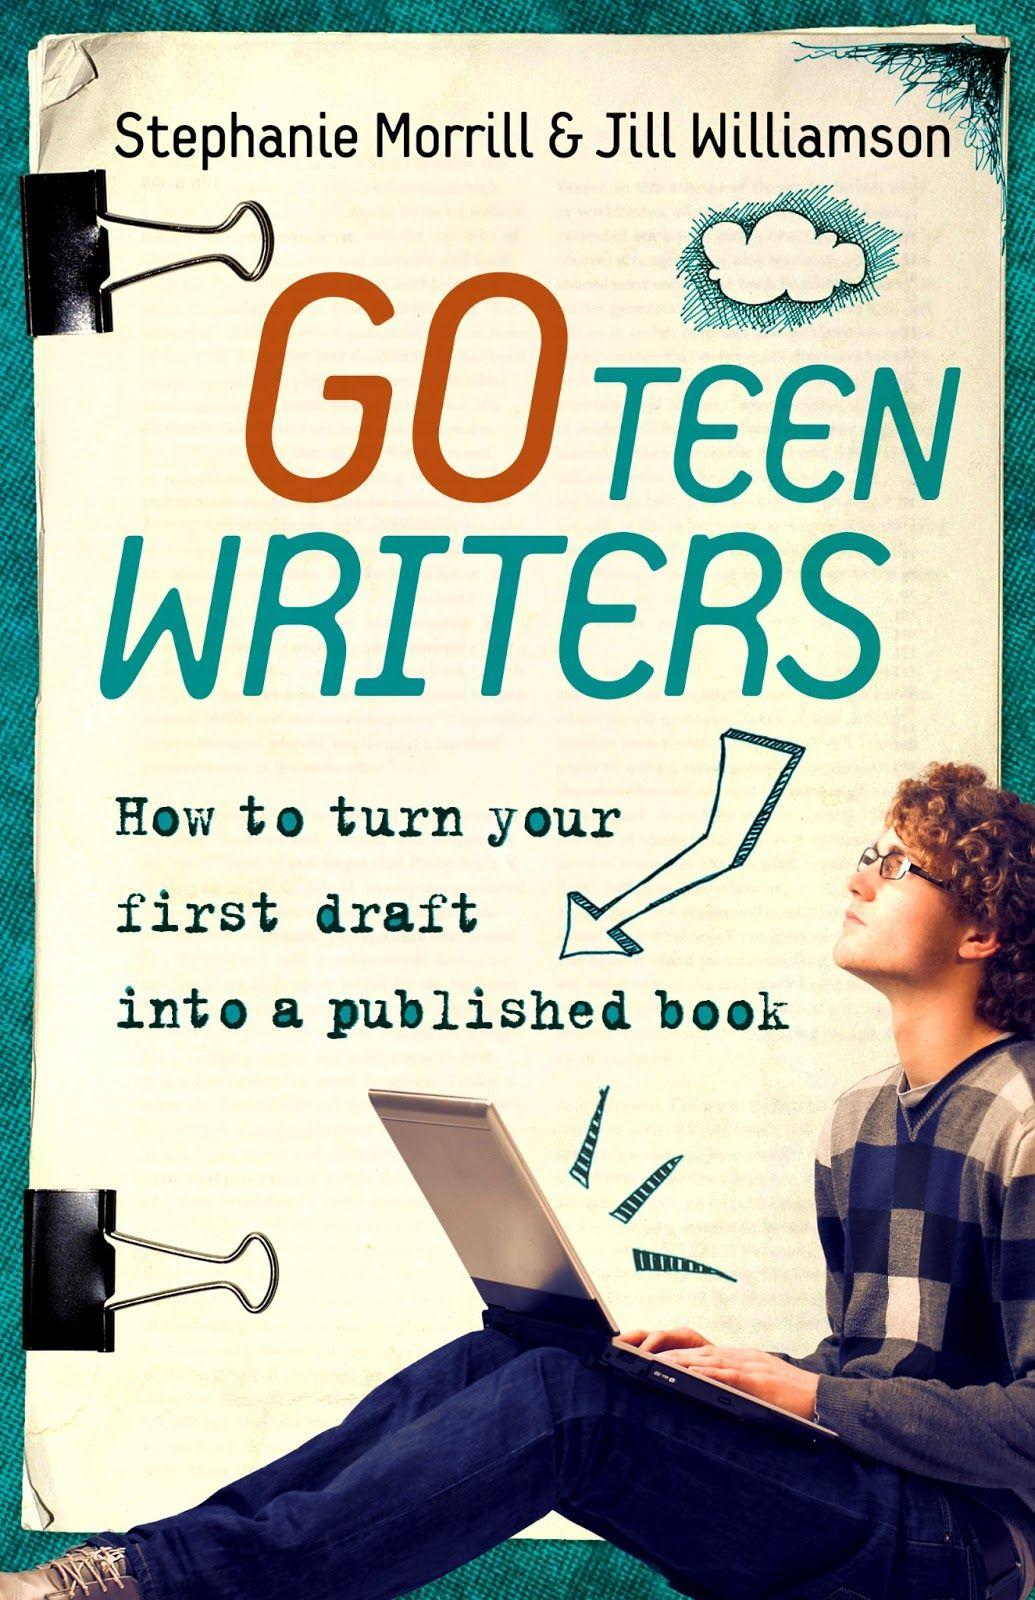 how to improve teenage writing skills